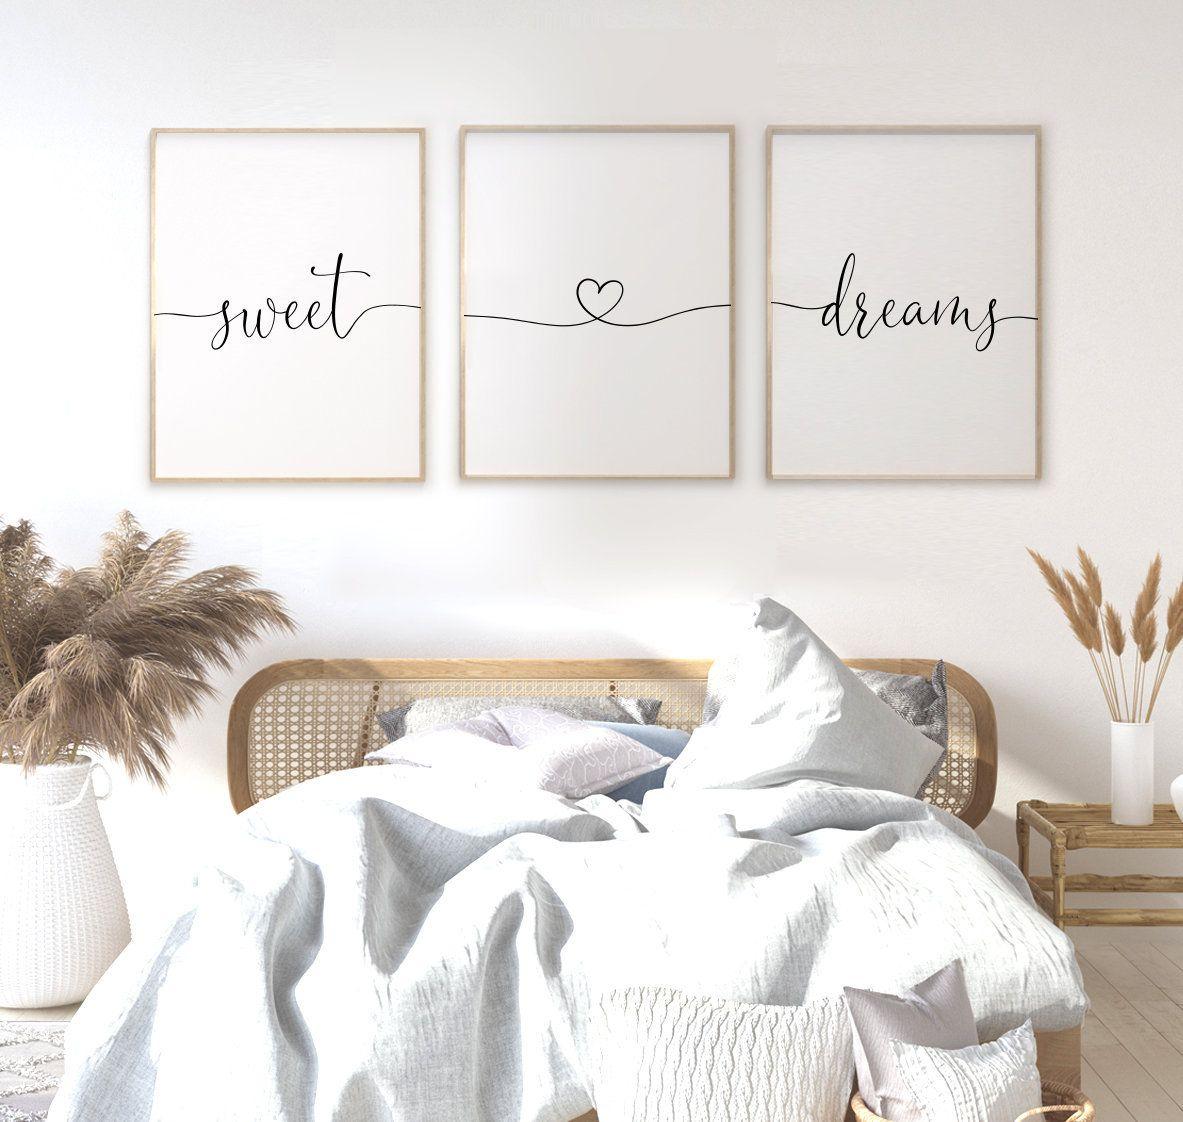 Sweet dreams headboard posters